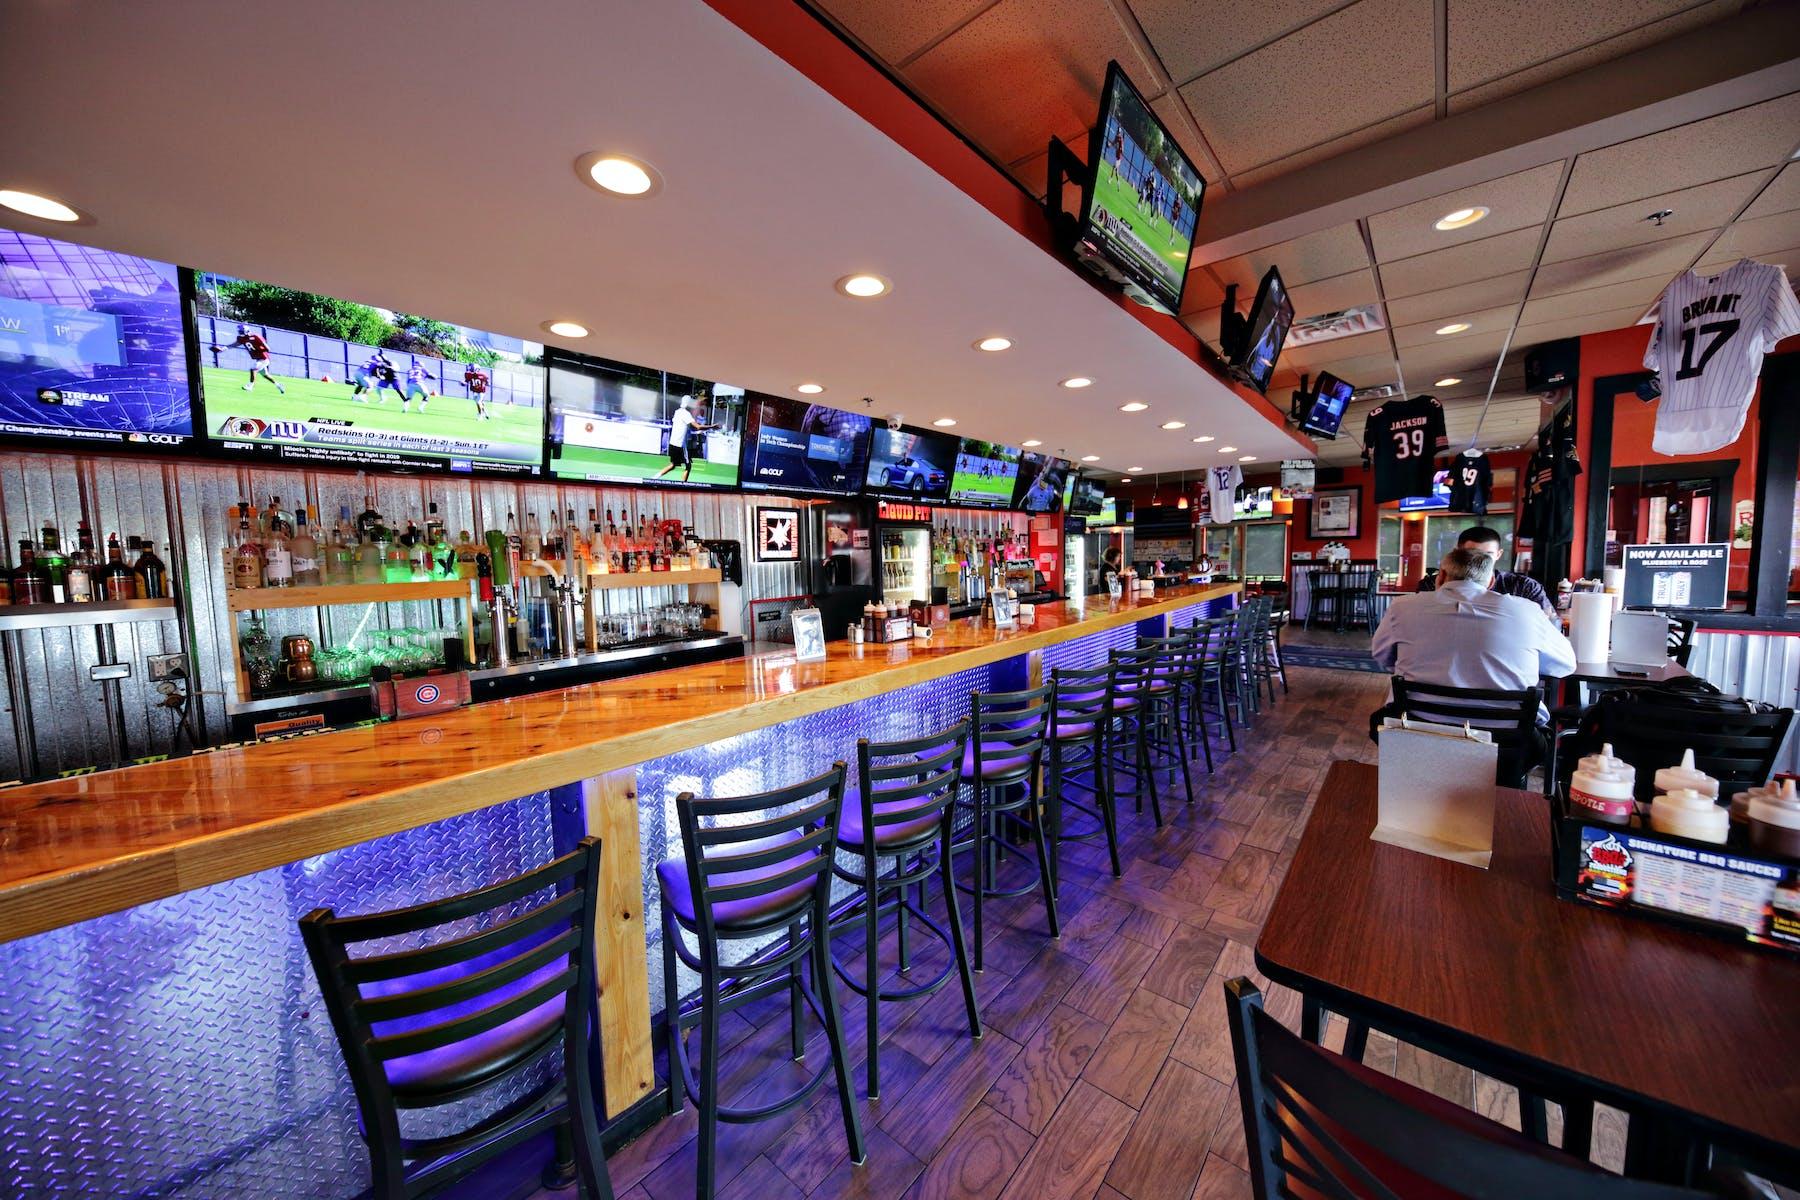 bar & grill in kenosha, lake zurich bar & grill, third lake bar & grill